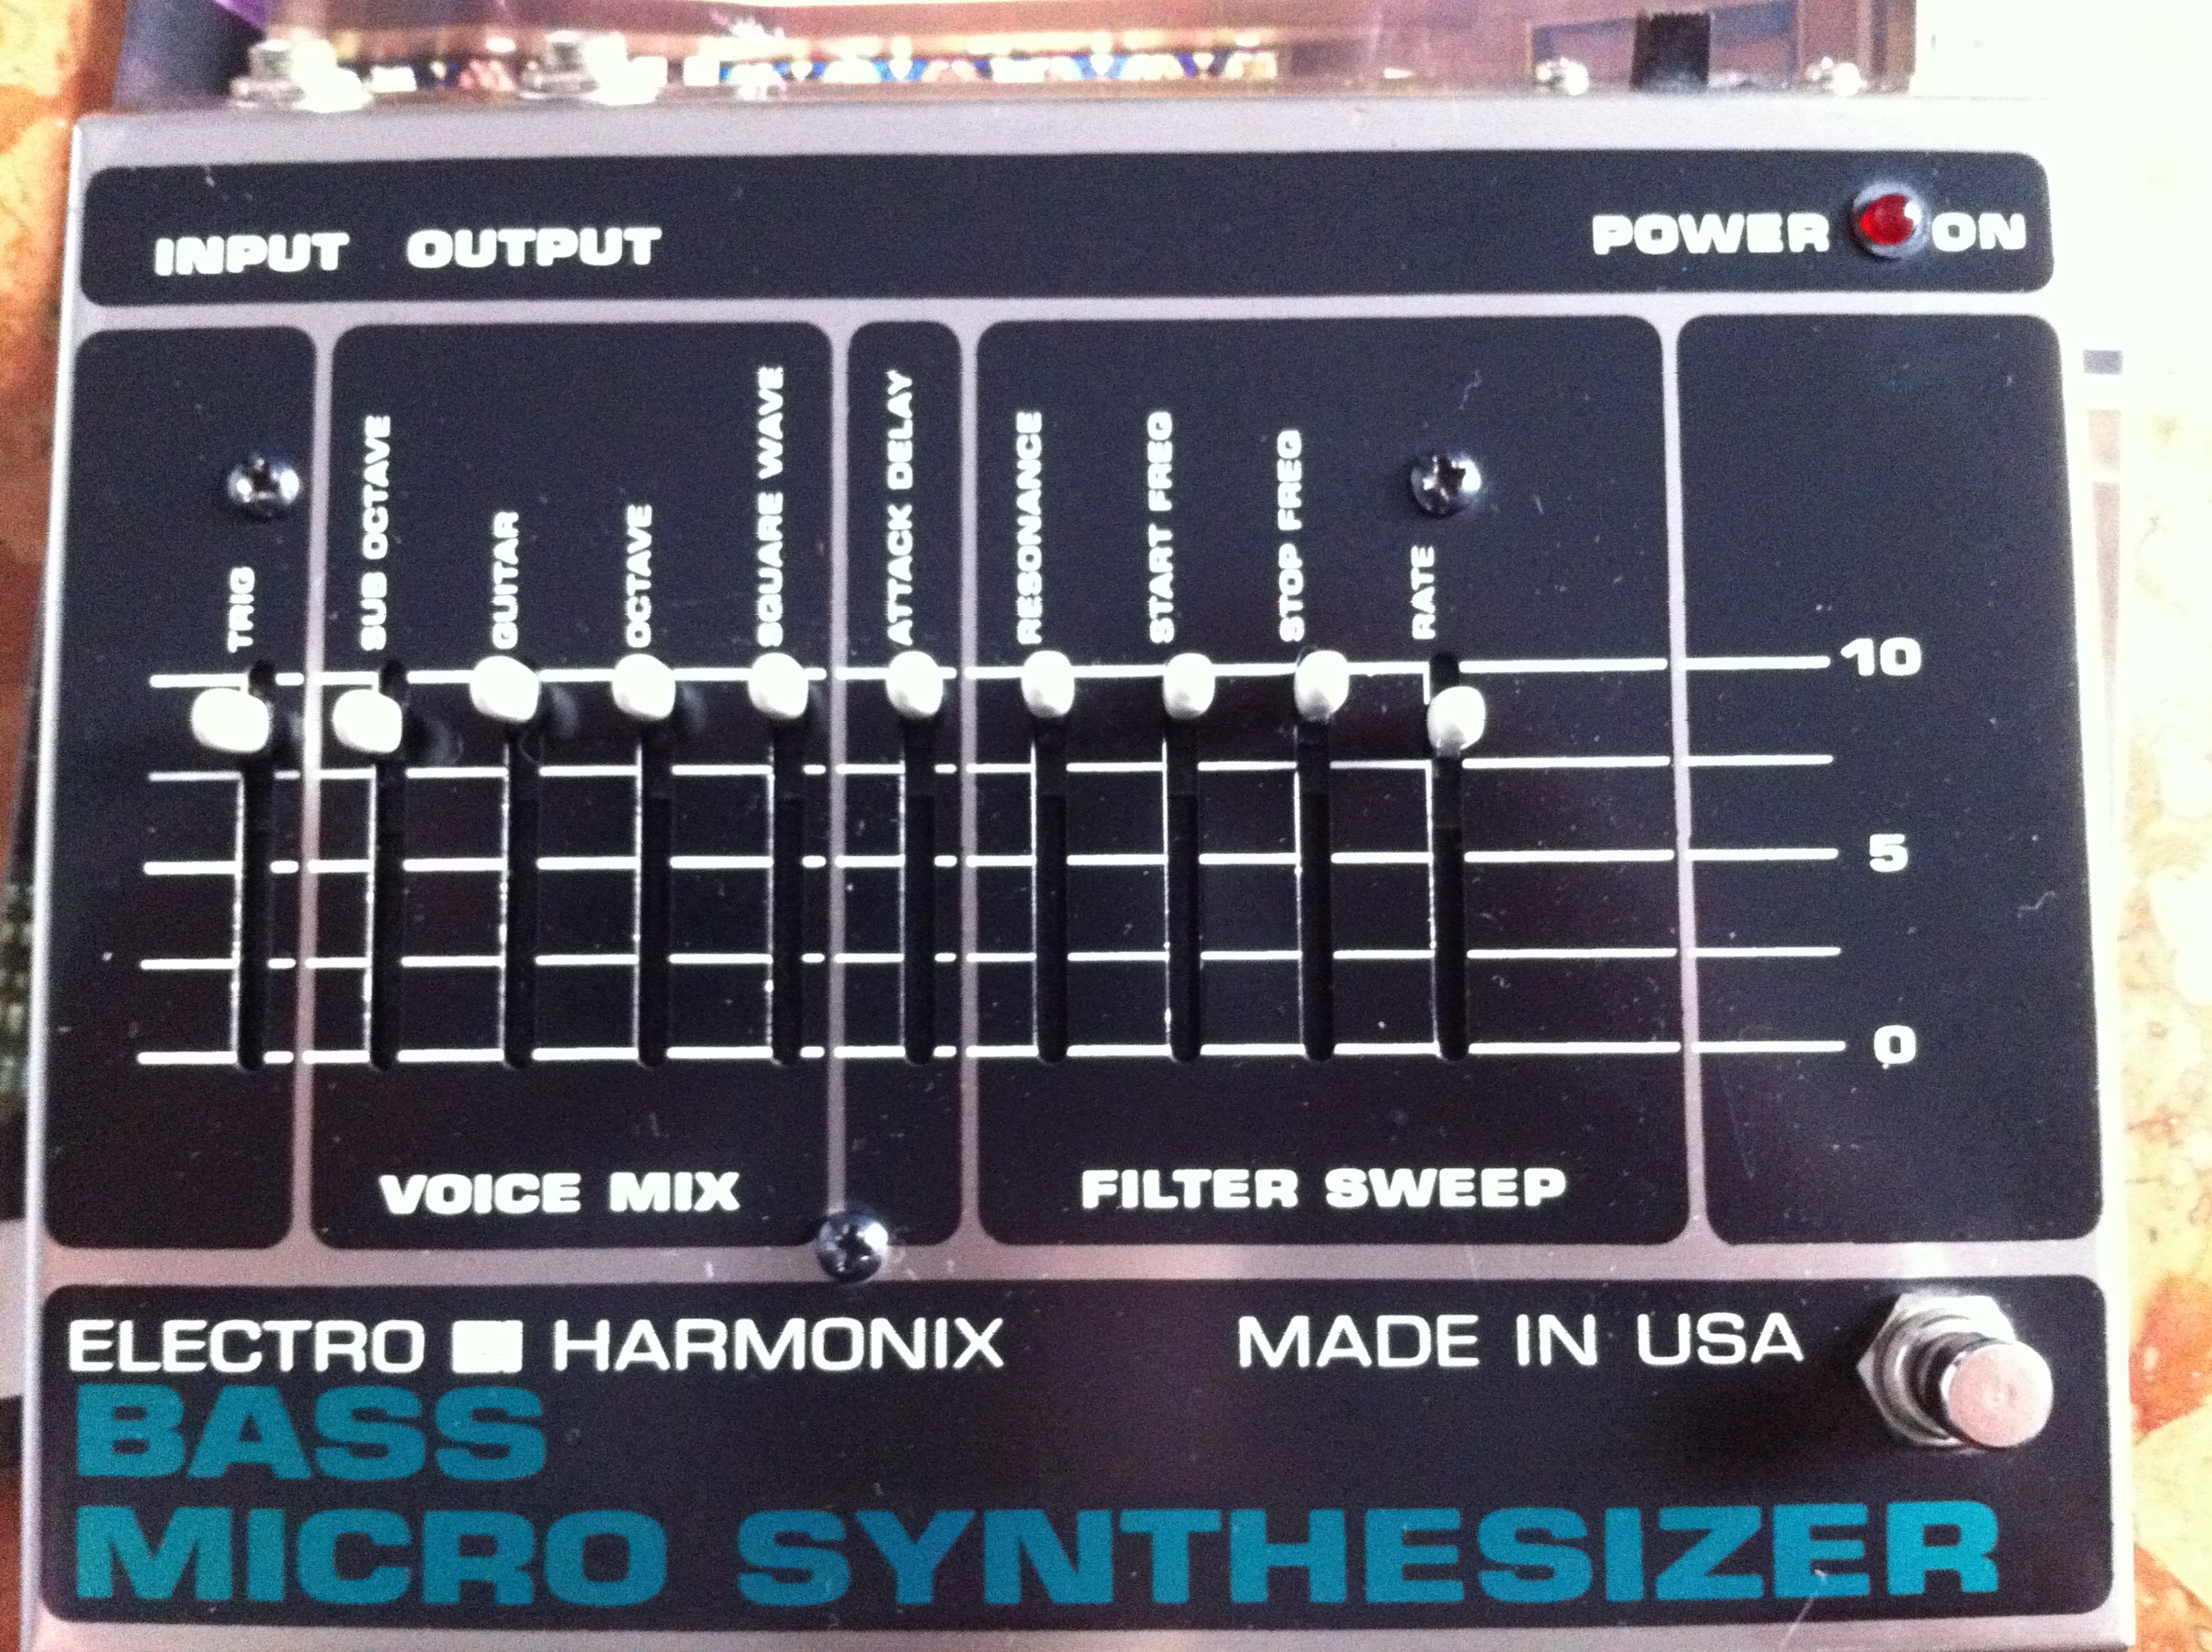 electro harmonix bass micro synthesizer original image 279799 audiofanzine. Black Bedroom Furniture Sets. Home Design Ideas